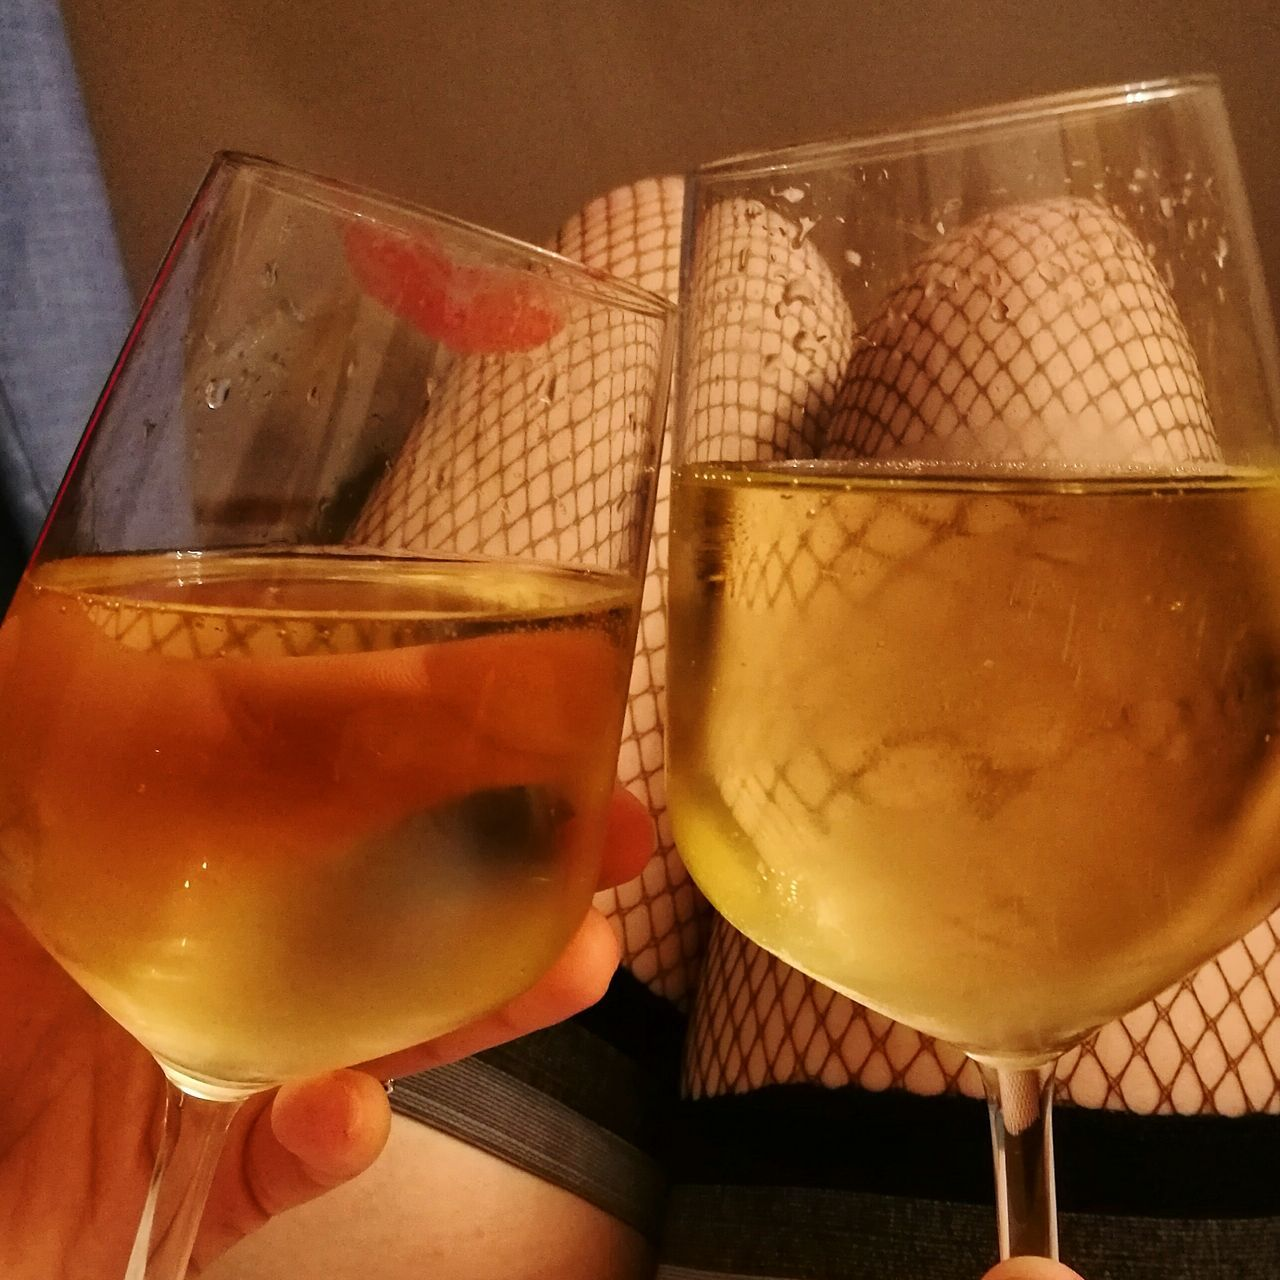 Drink Alcohol Food And Drink Cocktail Night Love❤ Zakochani! Warszawa Polska 🇵🇱 Fort Bema, Warszawa Kocham Cie ♥  Karolinka Refreshment Wine Drinking Glass Ice Cube Indoors  No People Close-up